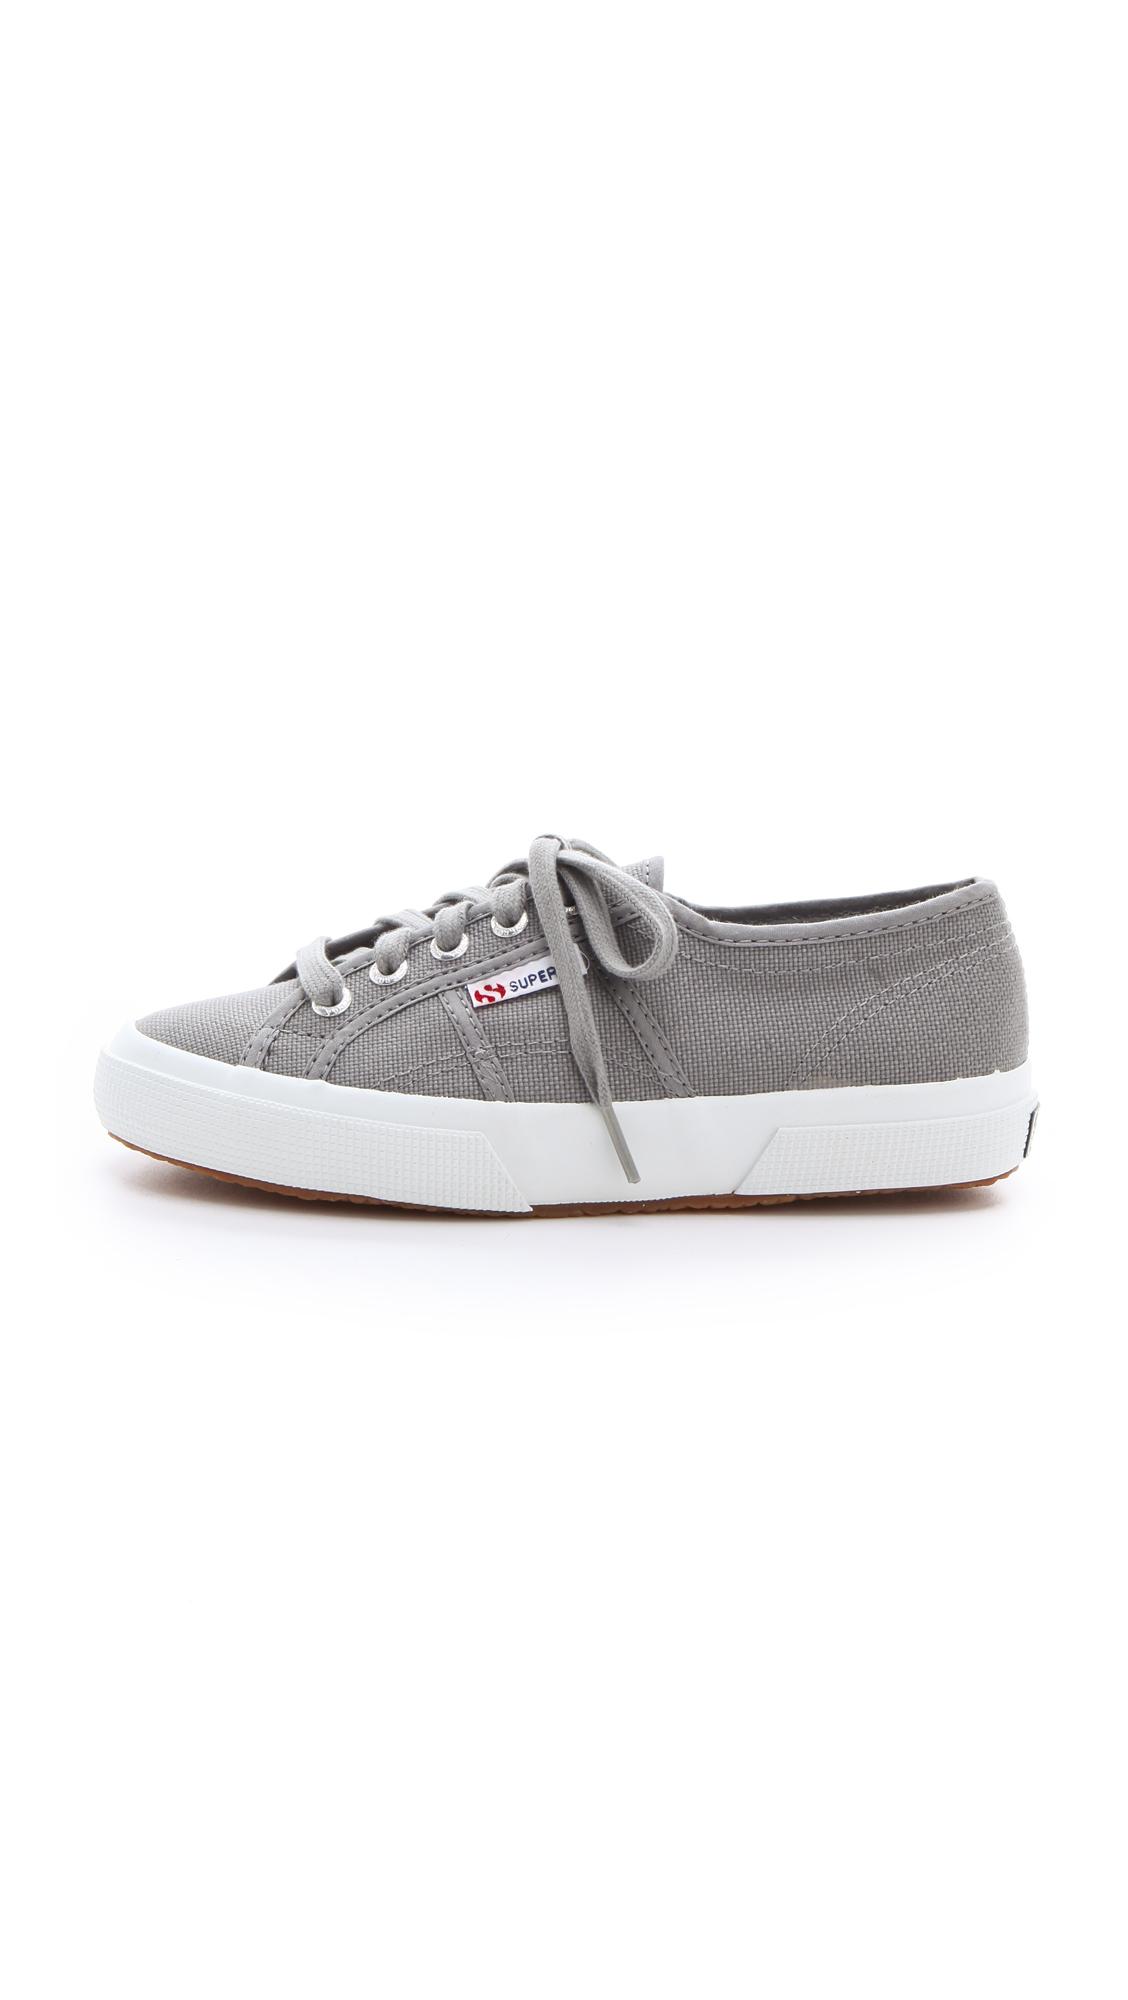 Superga Cotu Classic Sneakers | SHOPBOP